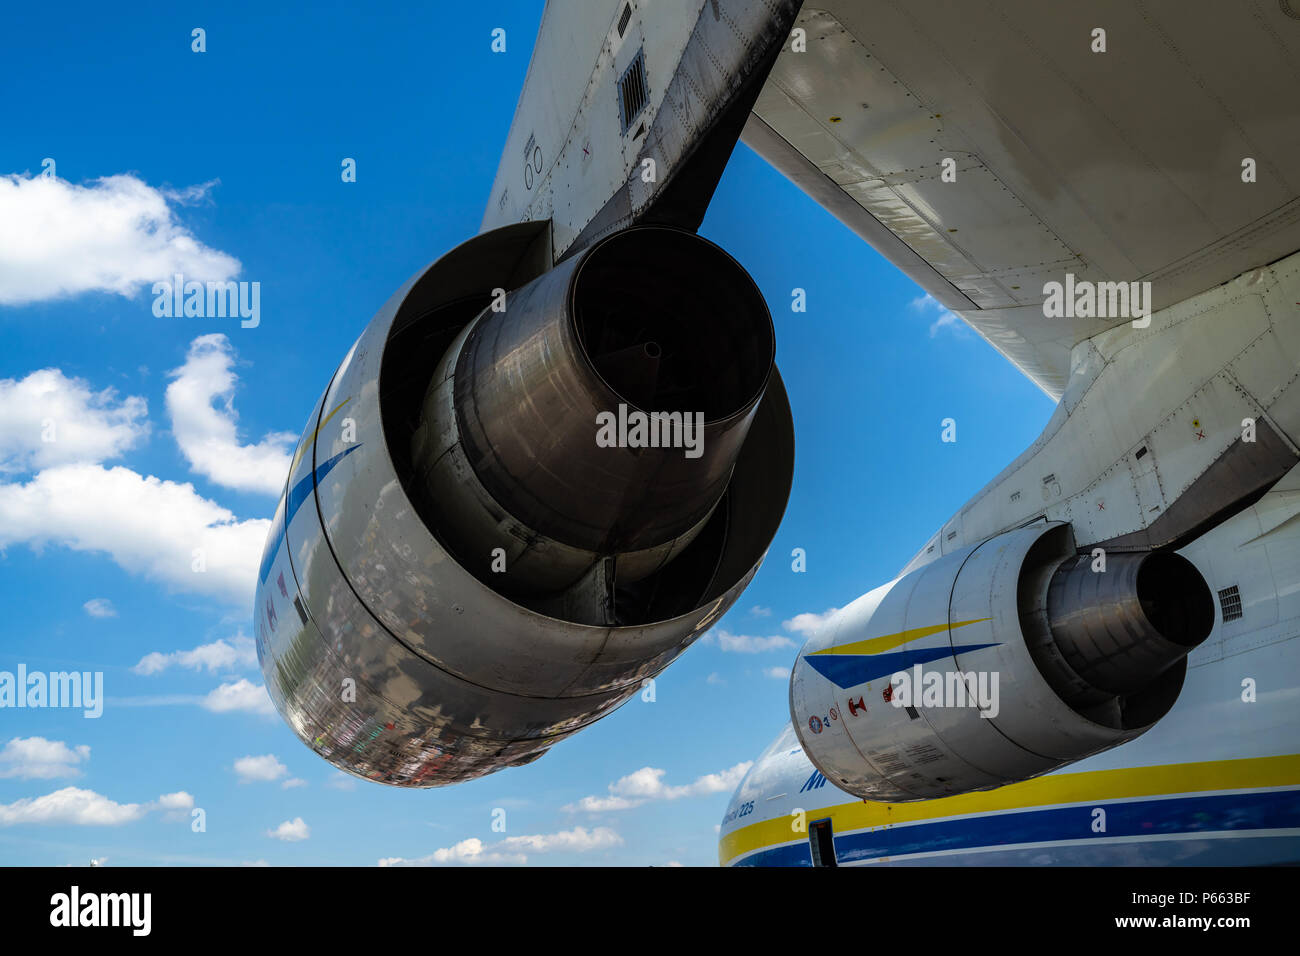 Turbofans Progress D-18T of the strategic airliner Antonov An-225 Mriya by Antonov Airlines. Exhibition ILA Berlin Air Show 2018 - Stock Image